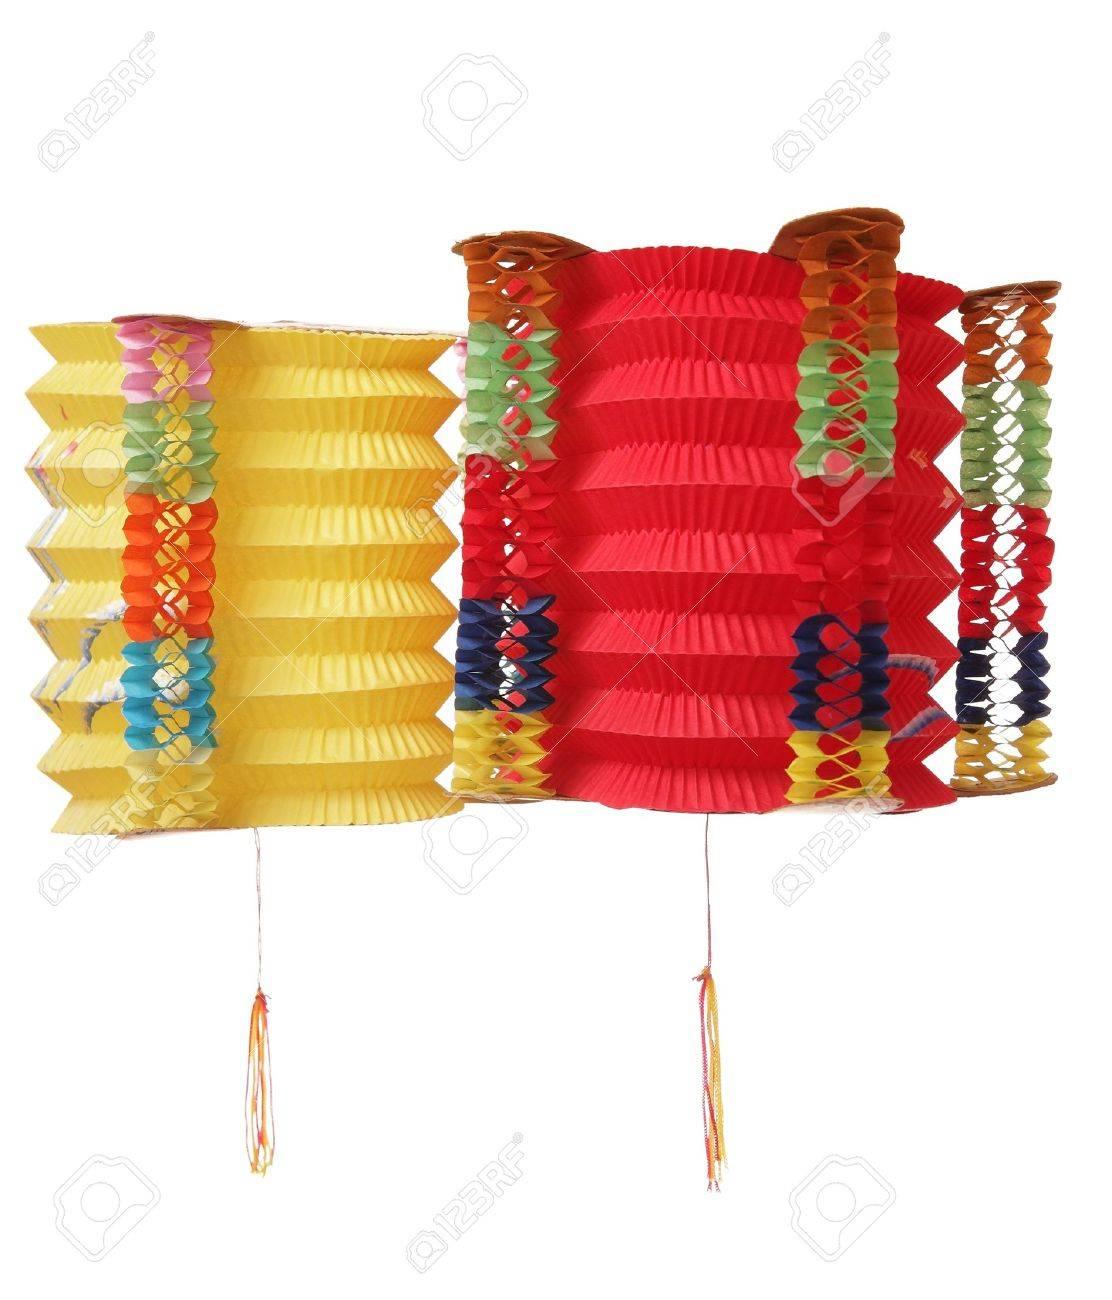 lantern for Chinese mid autumn festival Stock Photo - 7864779